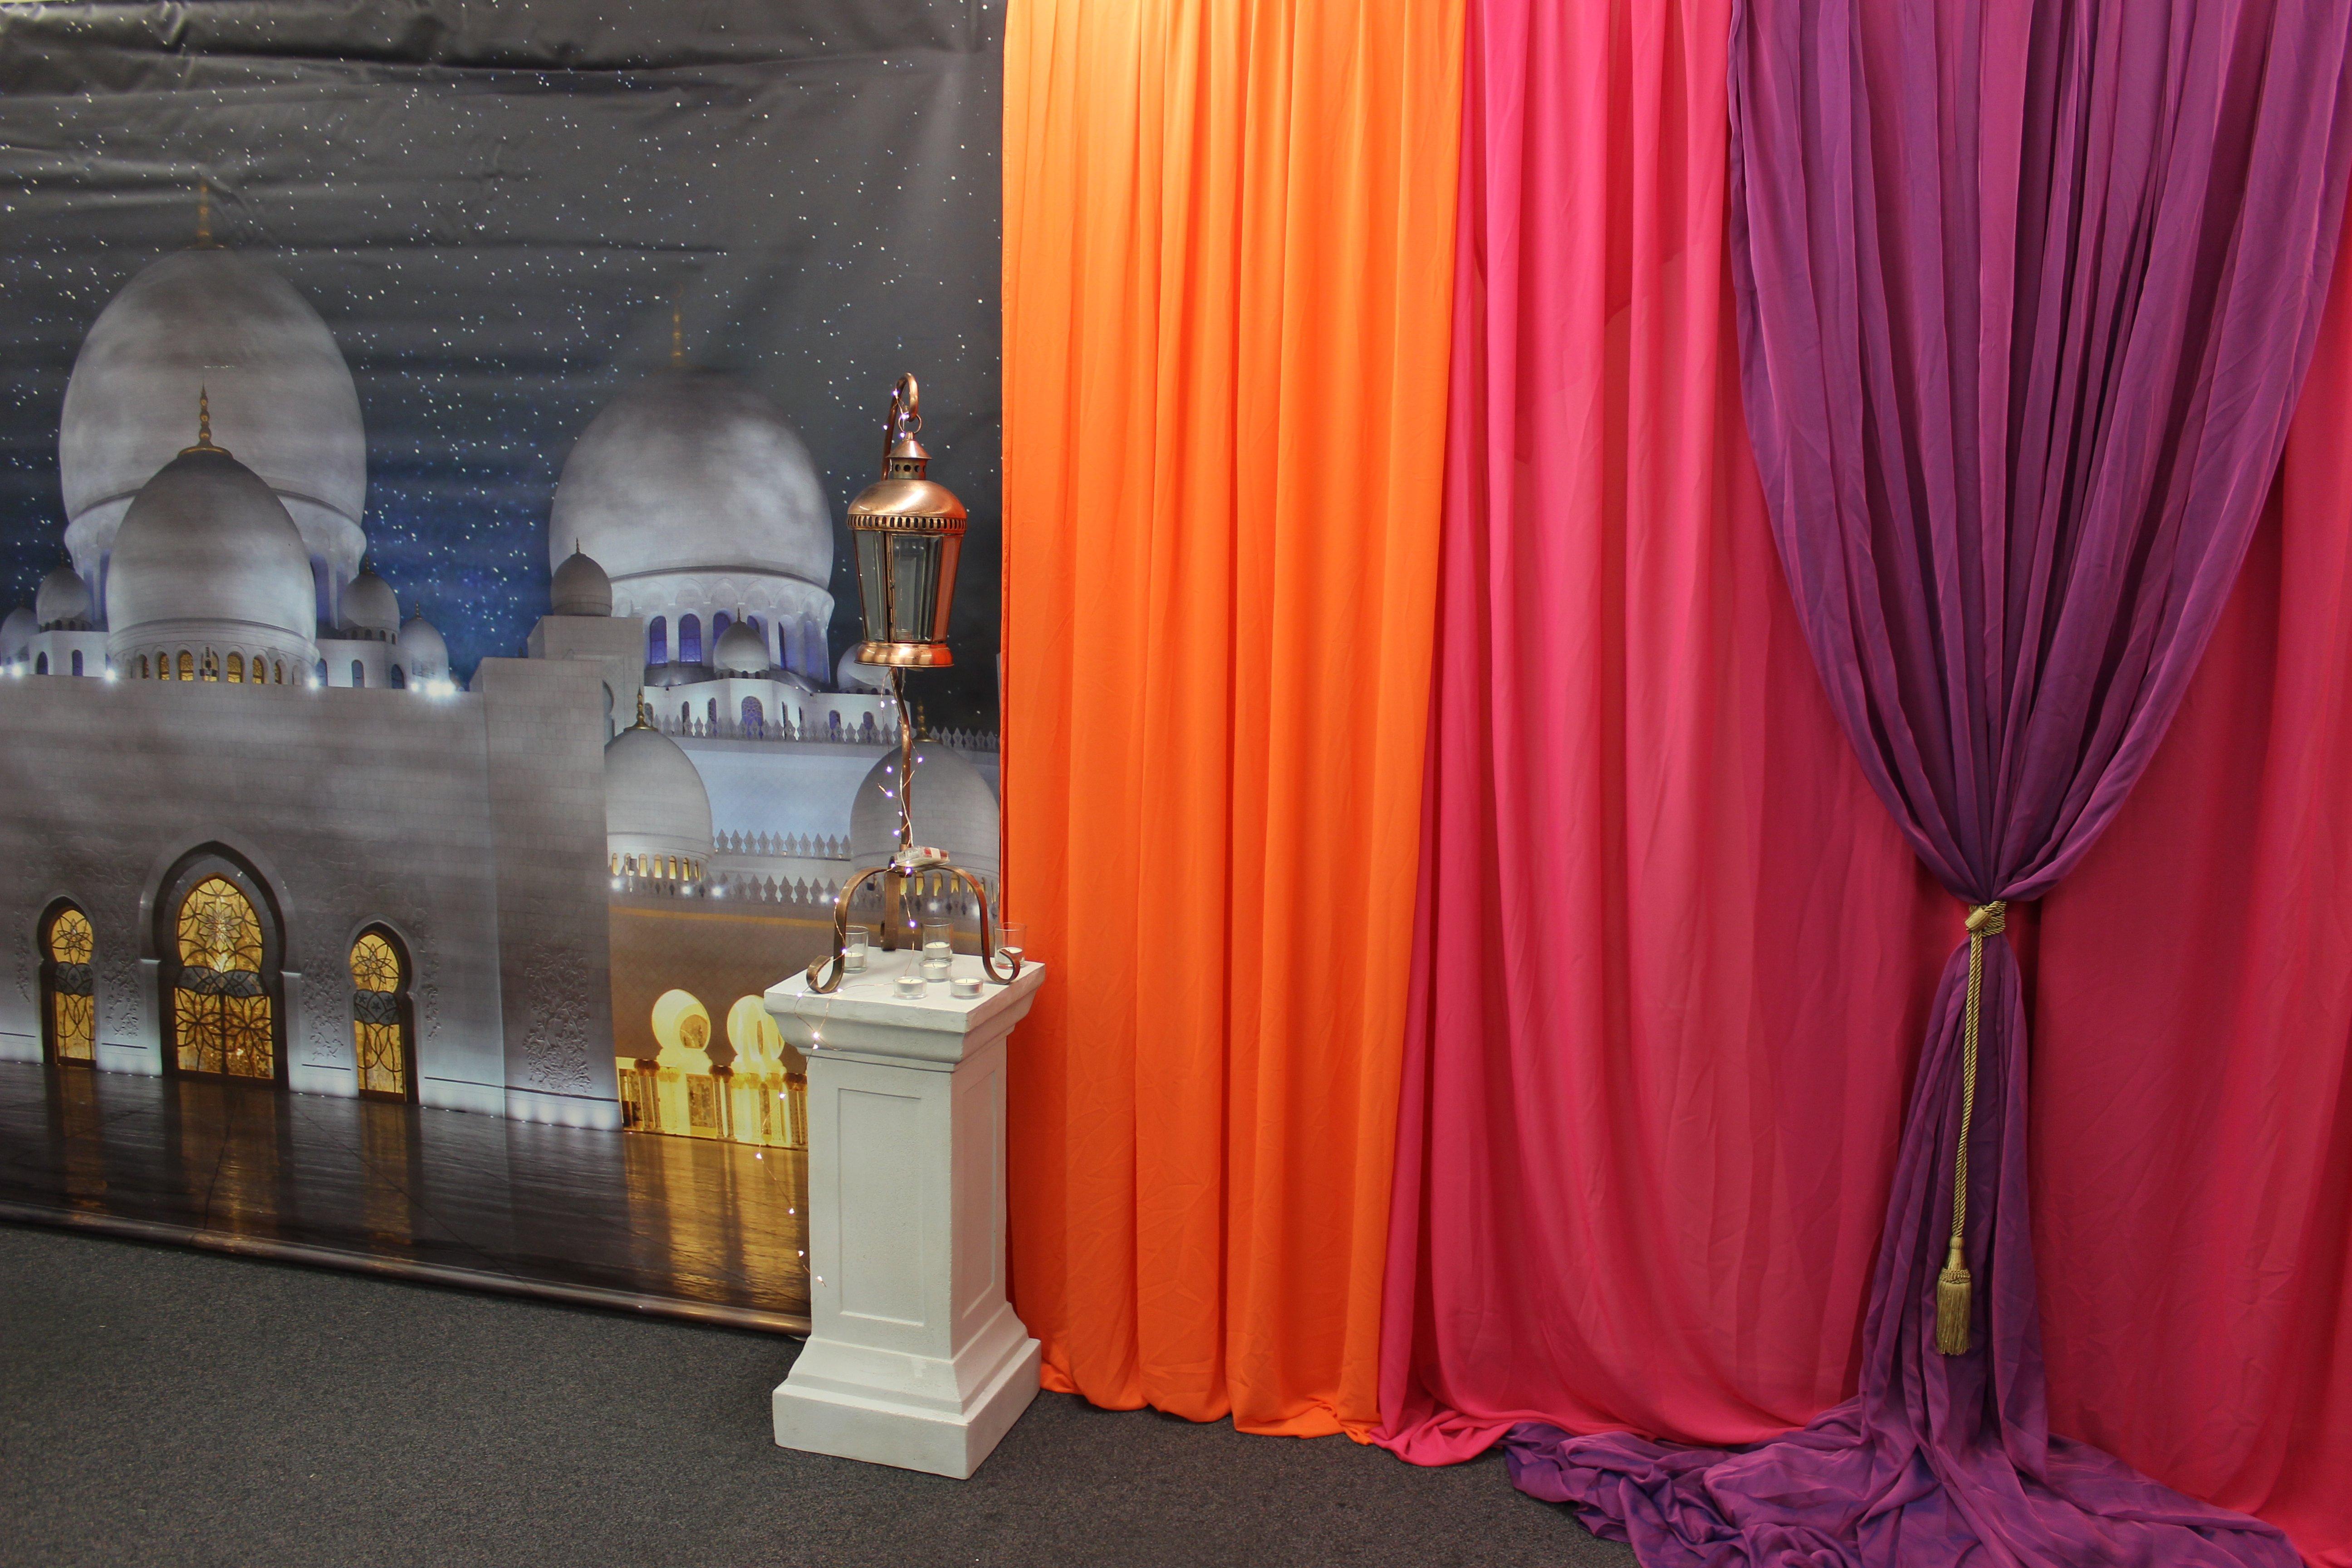 Orange, pink & purple draped backdrop